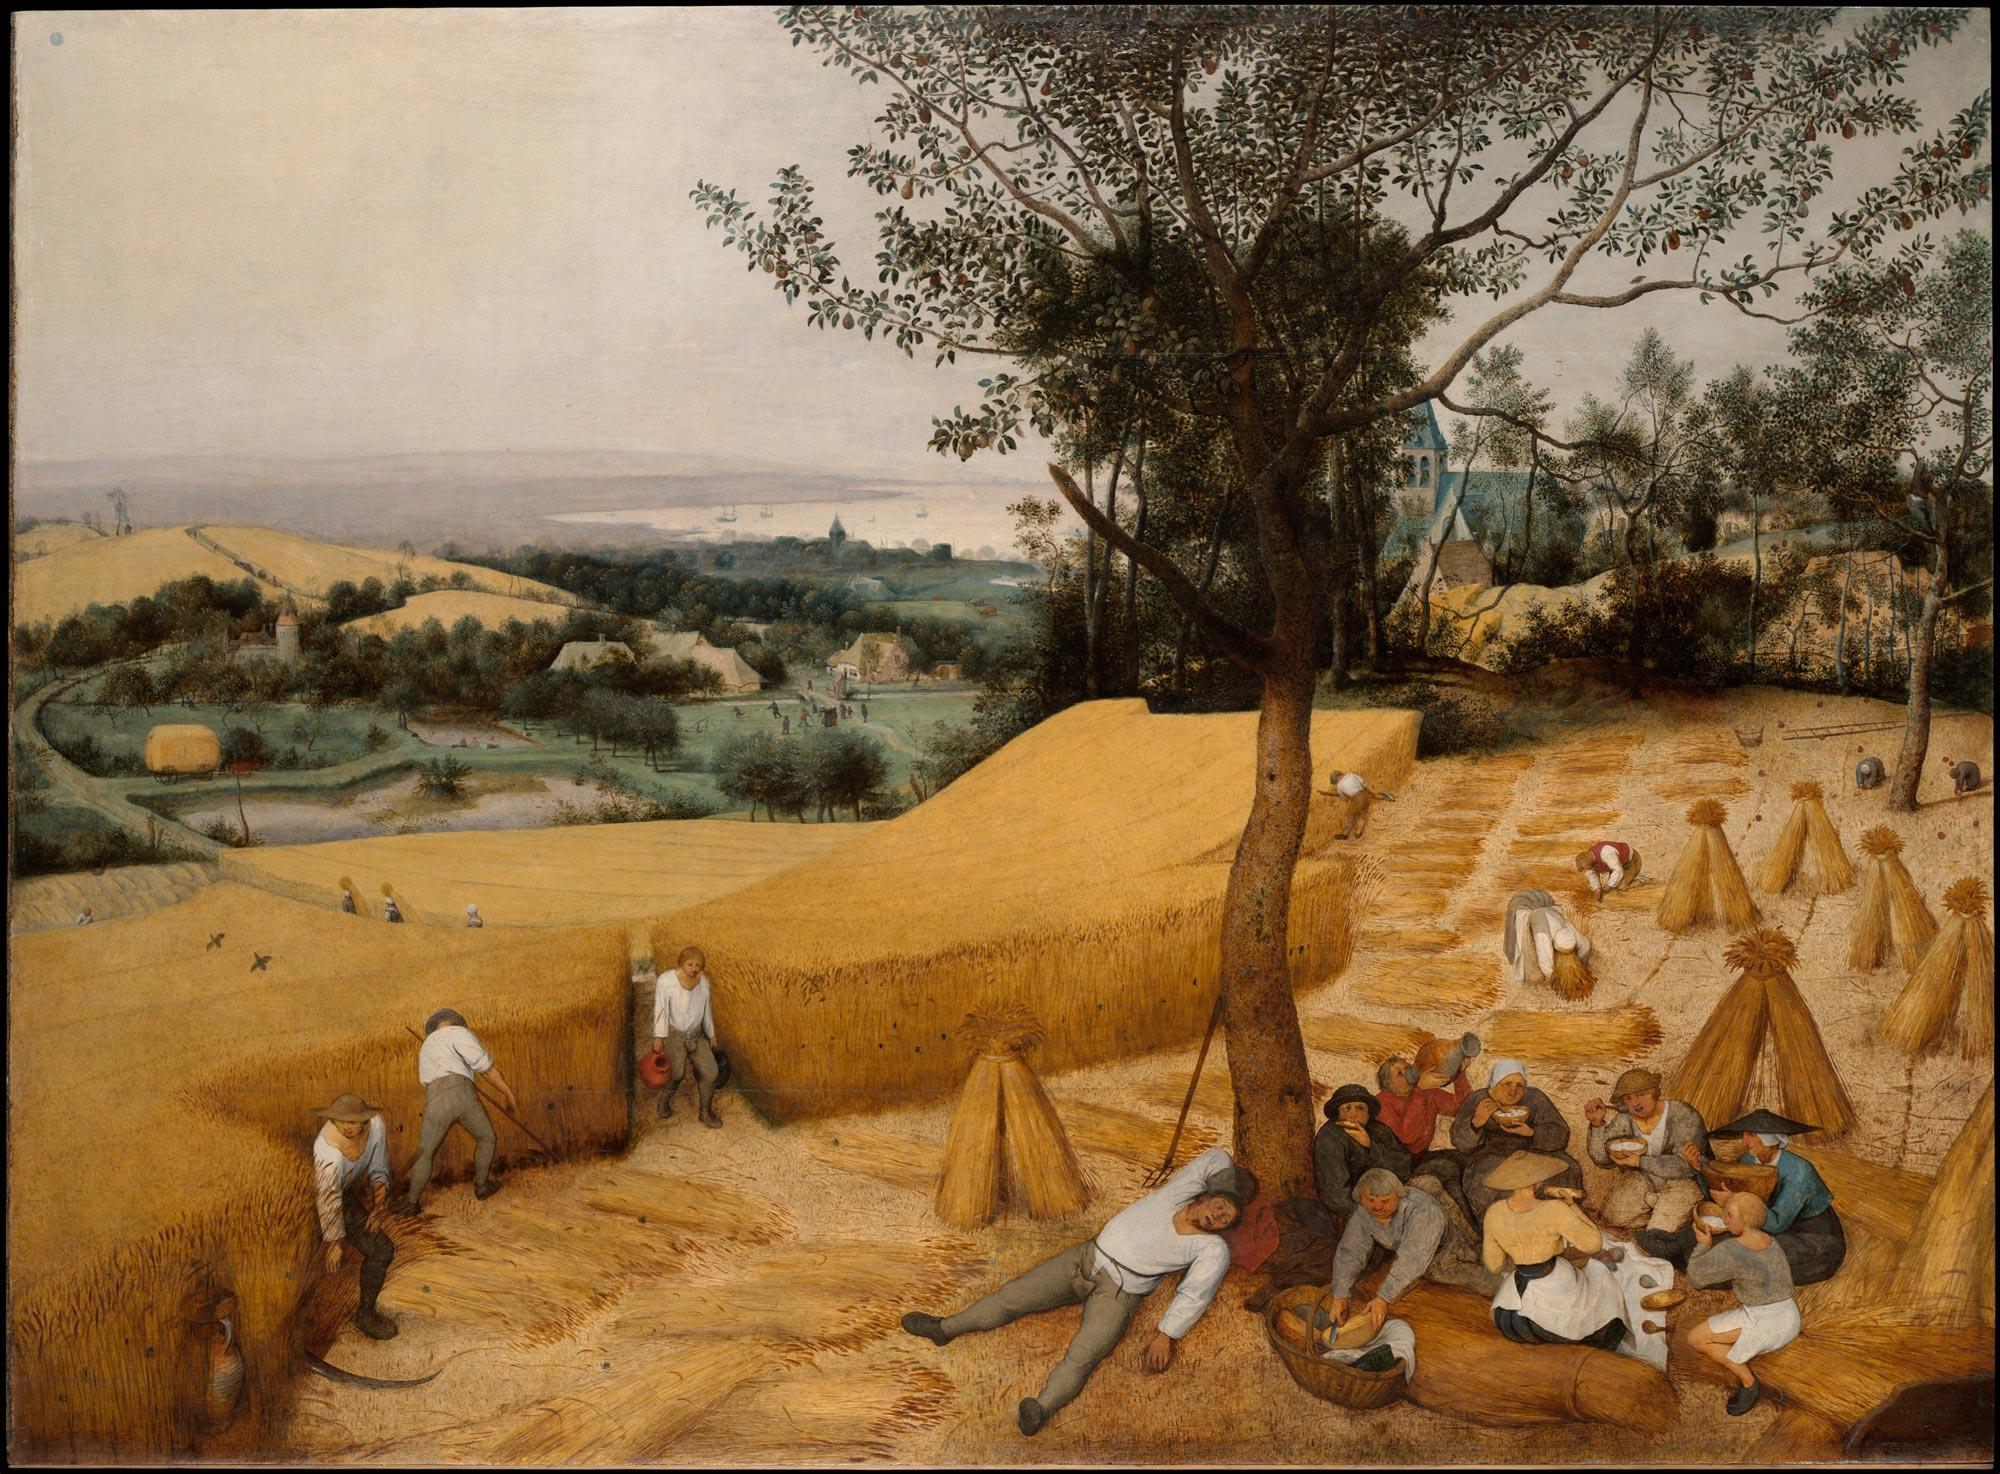 Pieter Bruegel, La mietitura (1565; olio su tavola, 119 x 162 cm; New York, The Metropolitan Museum)